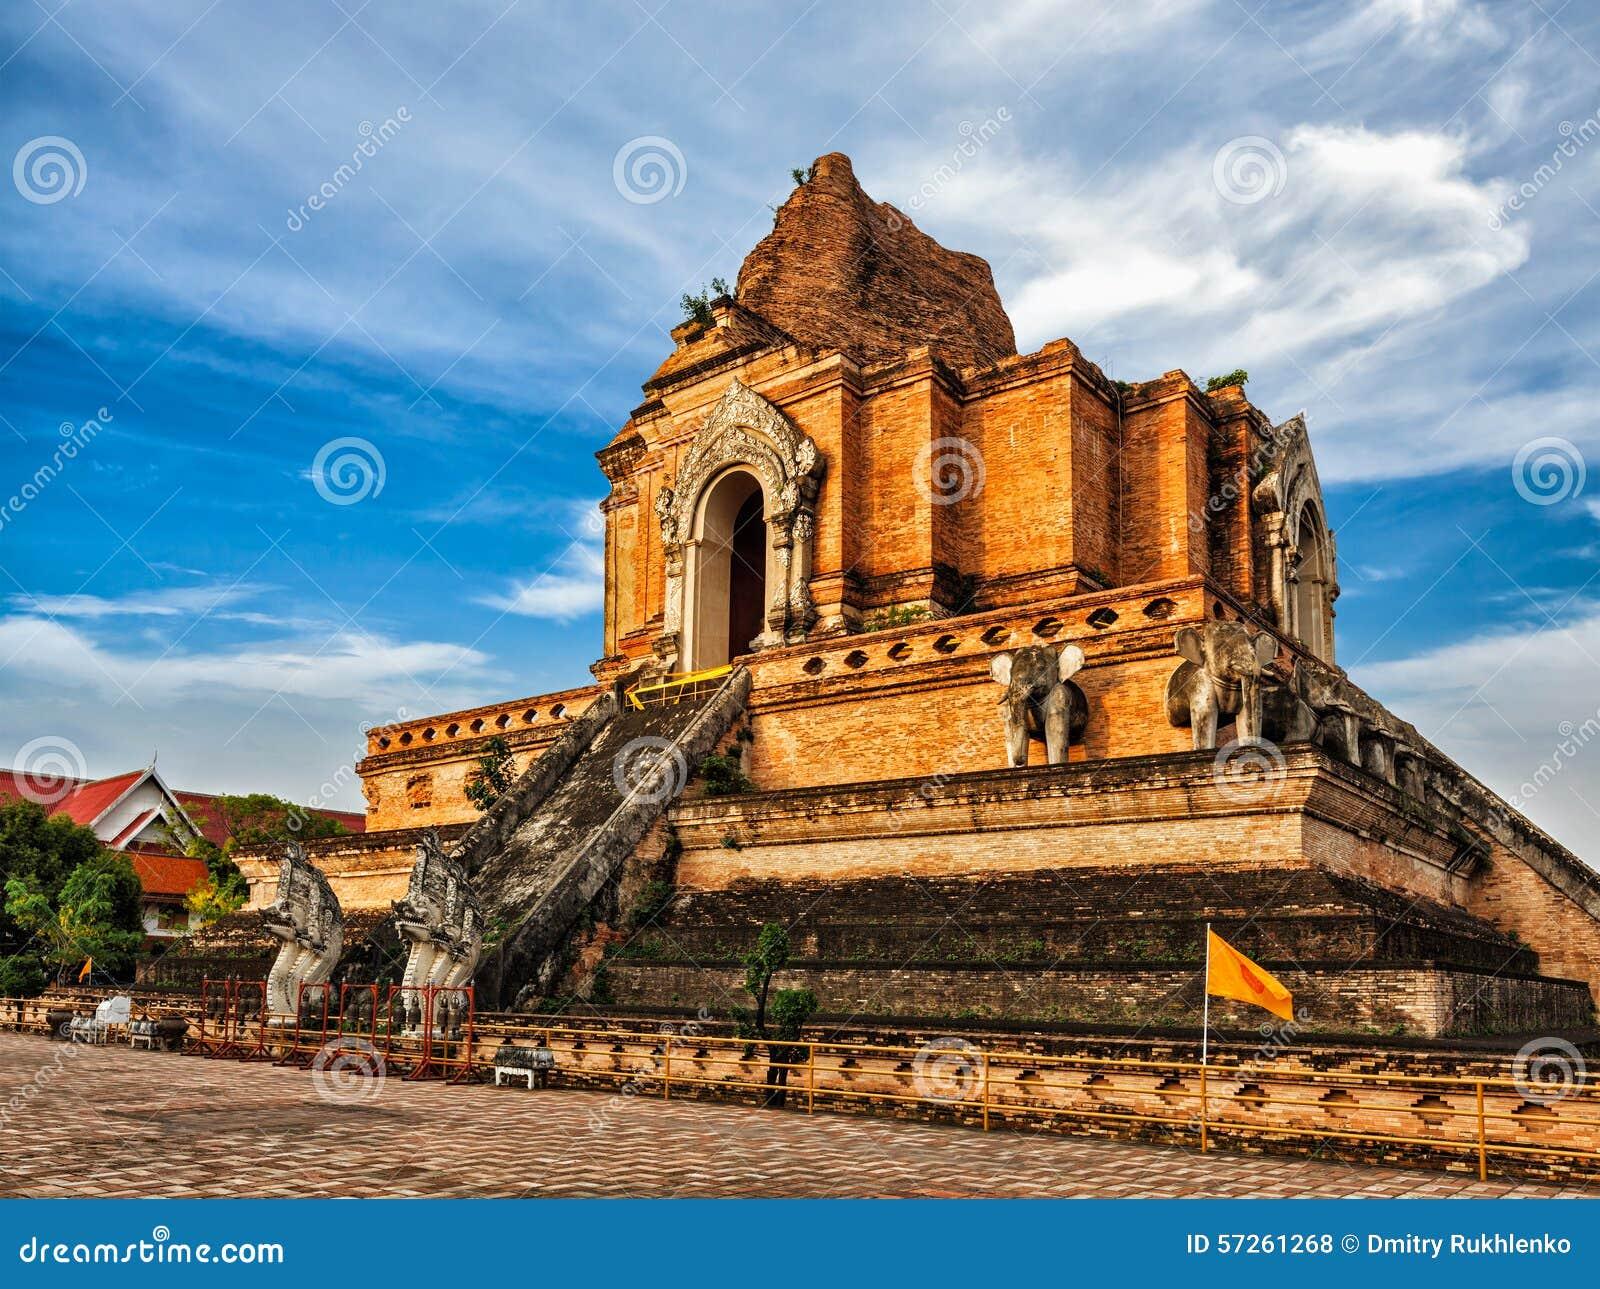 Wat Chedi Luang. Chiang Mai, Thailand Stock Photo - Image ...